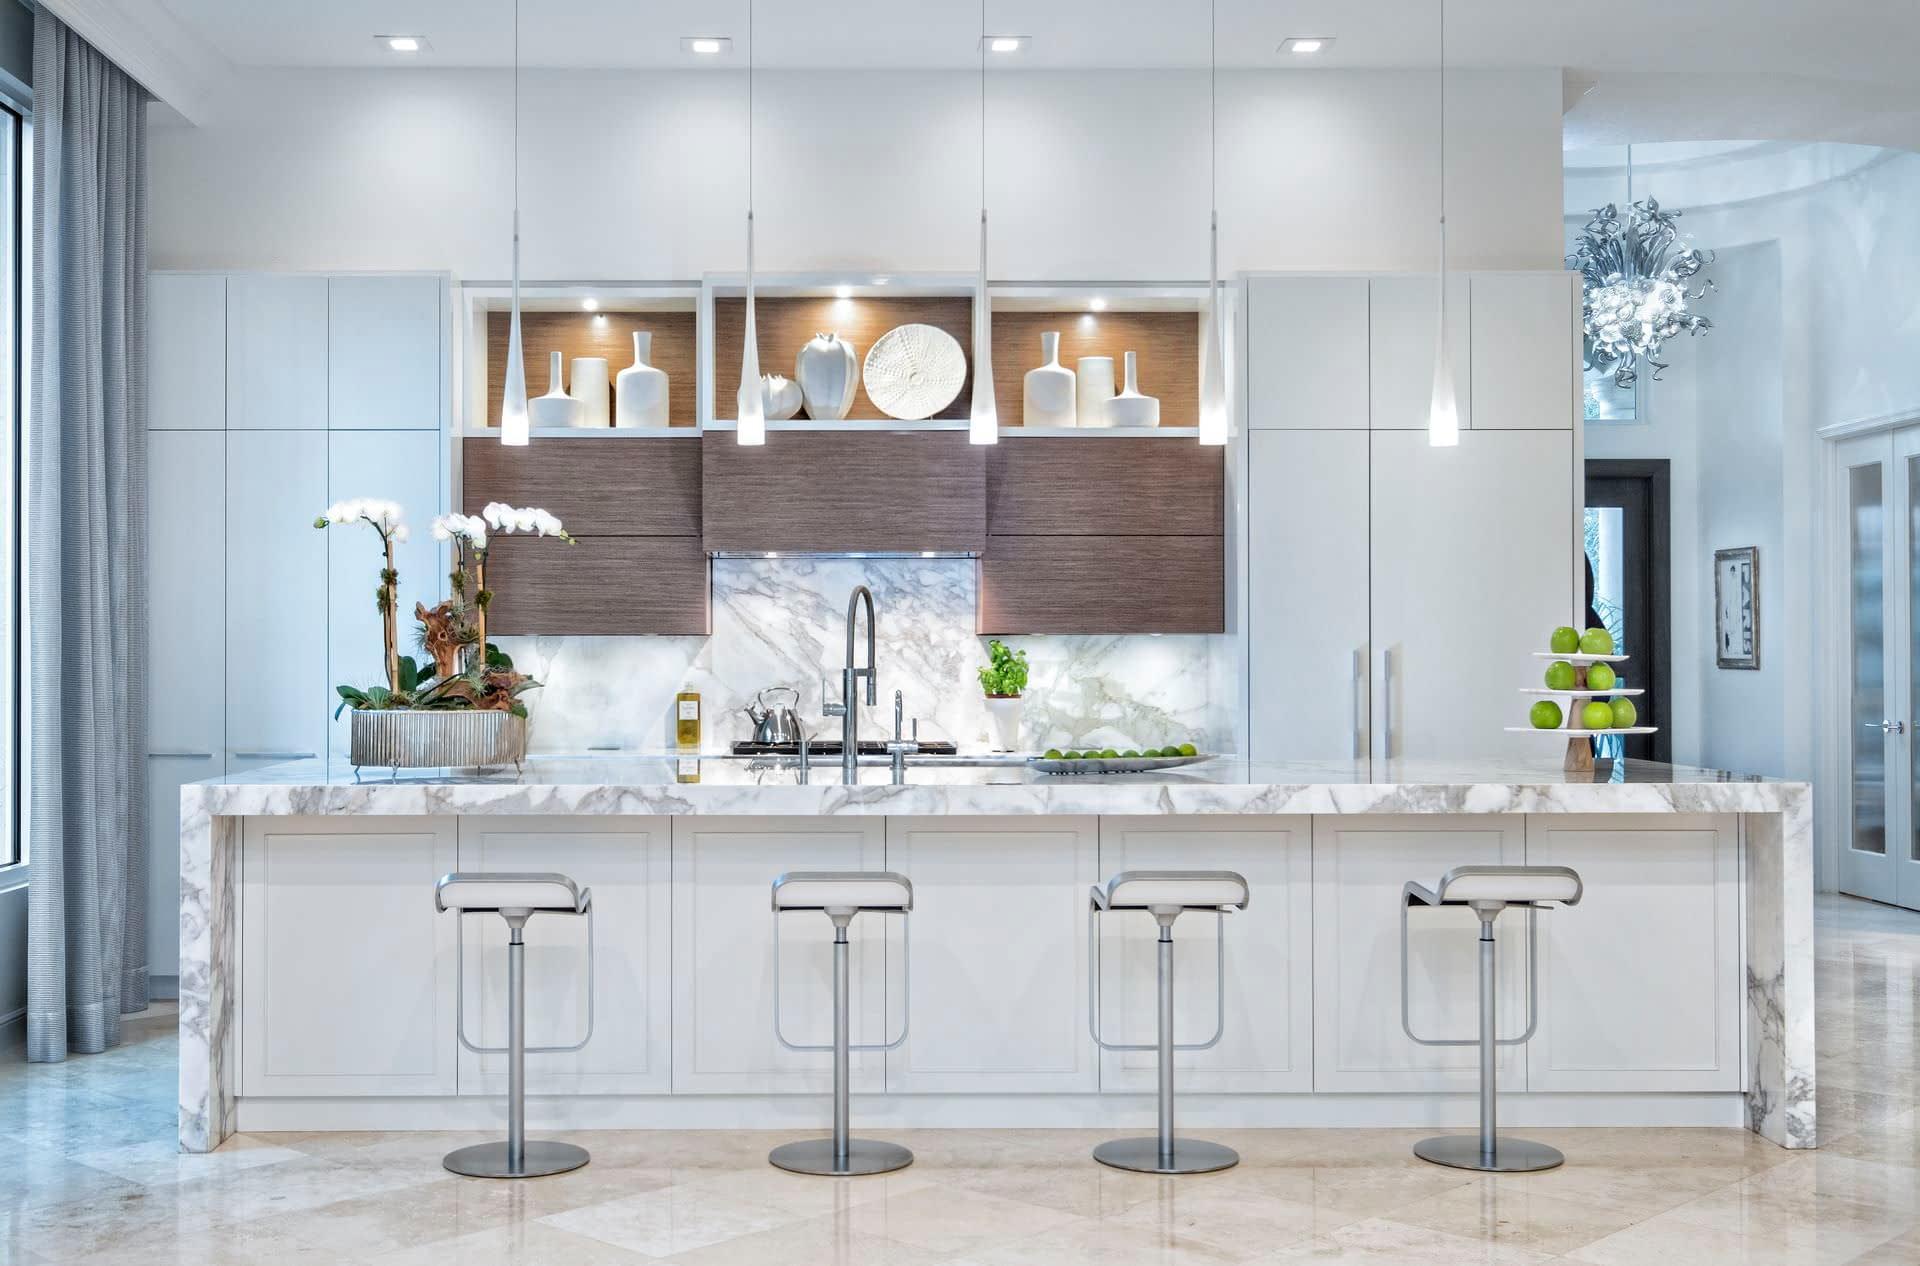 stunning white kitchen design by jeanette hubley